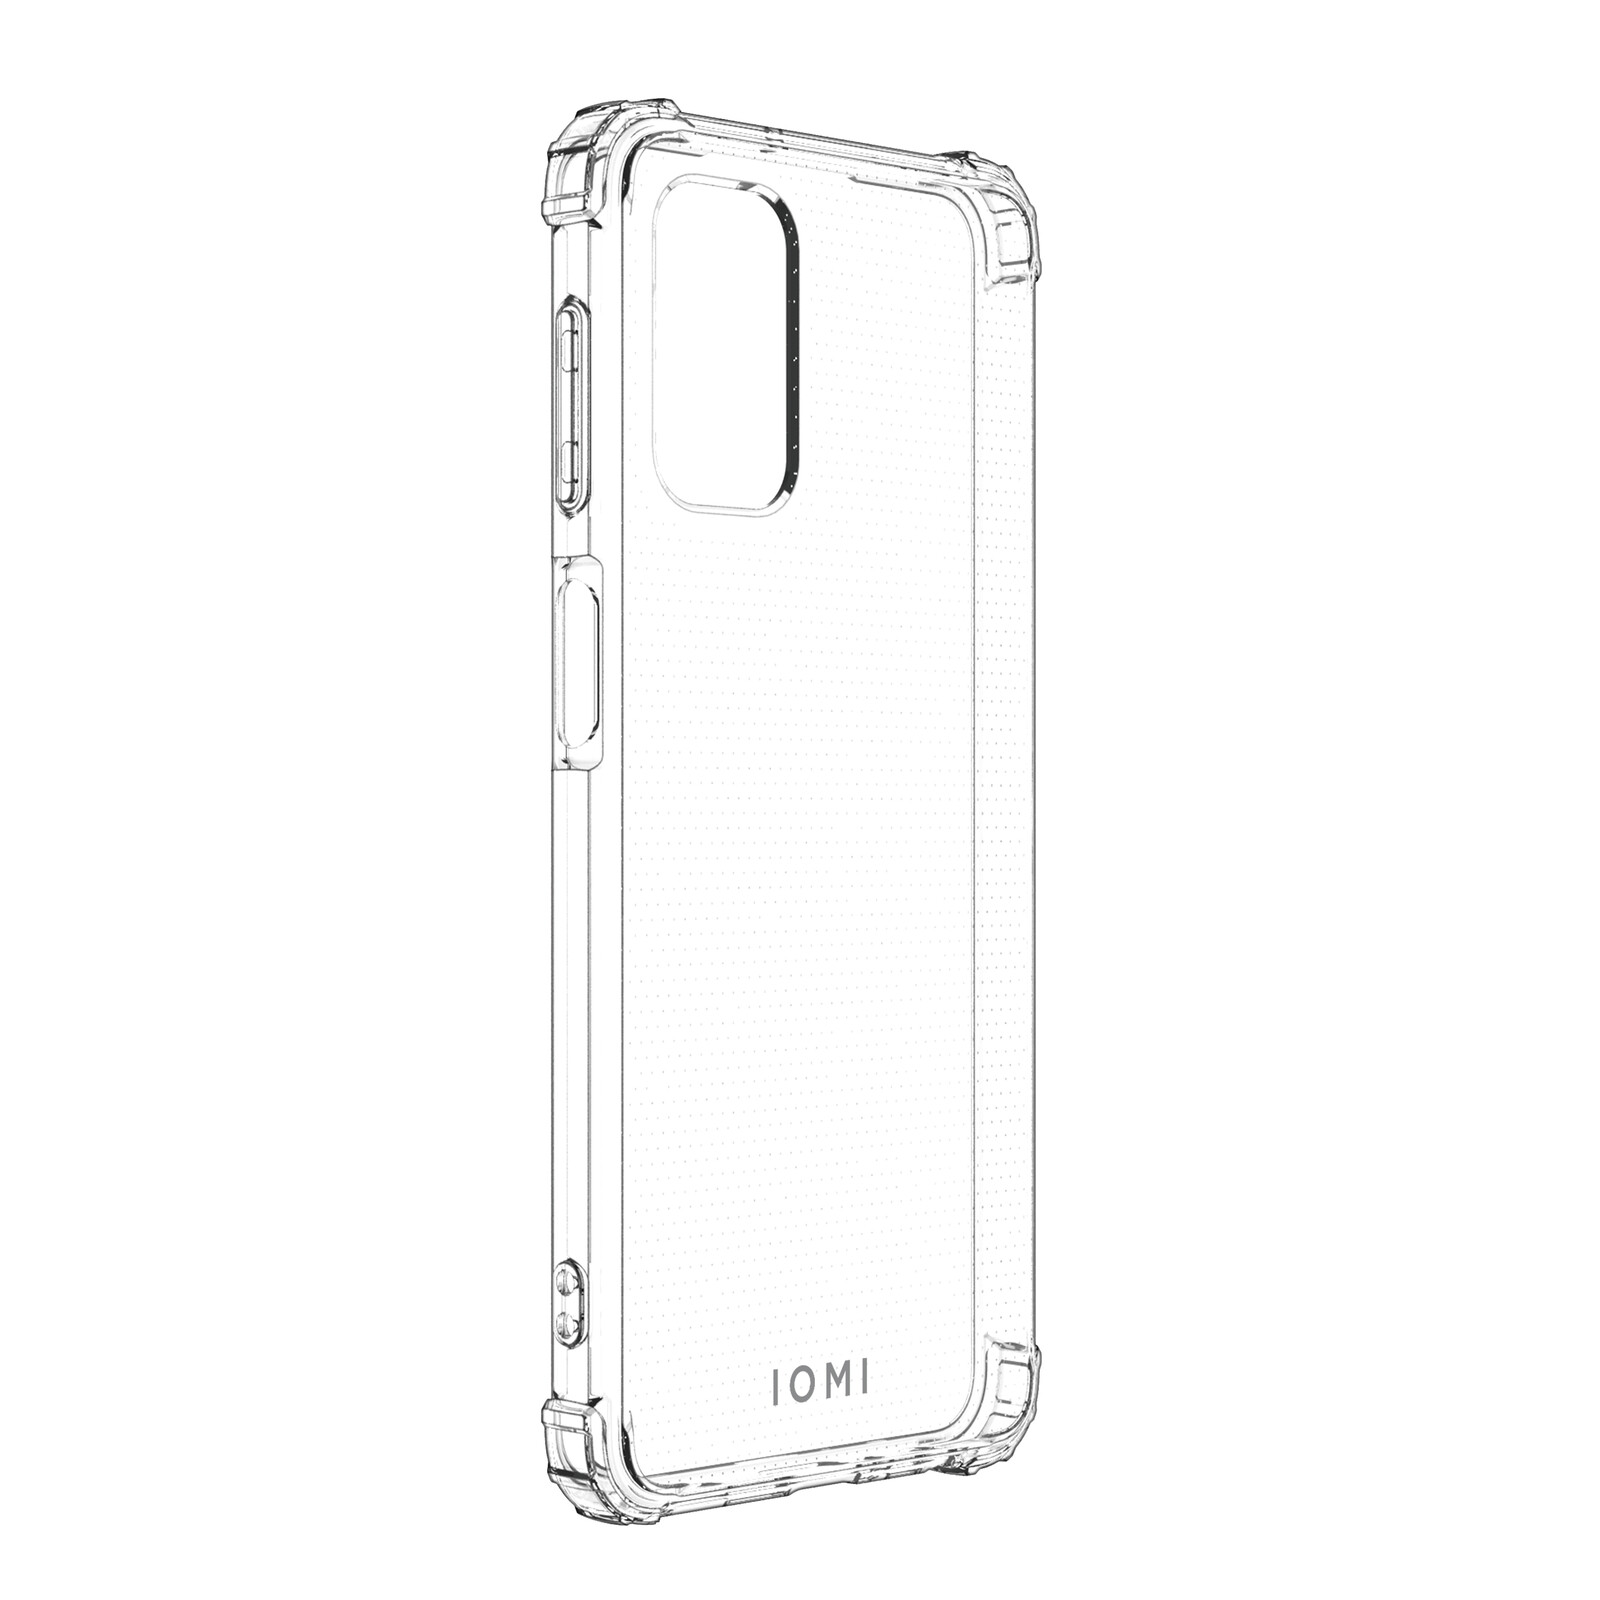 IOMI Backcover Shockproof Full Samsung Galaxy A32